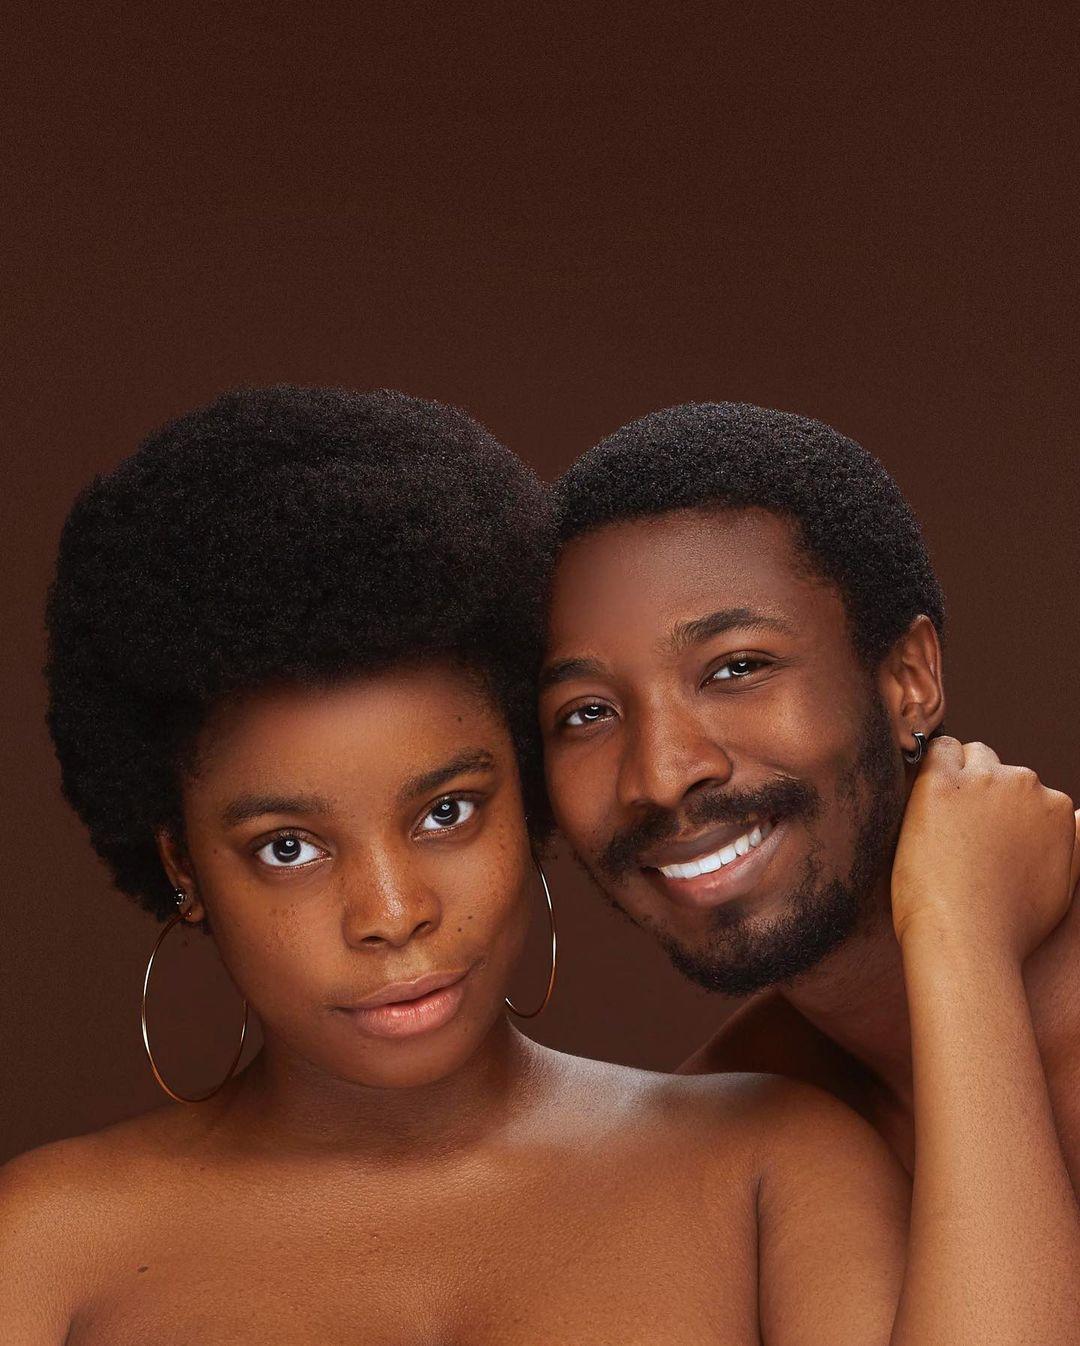 Made Kuti shares lovedup photos with his woman